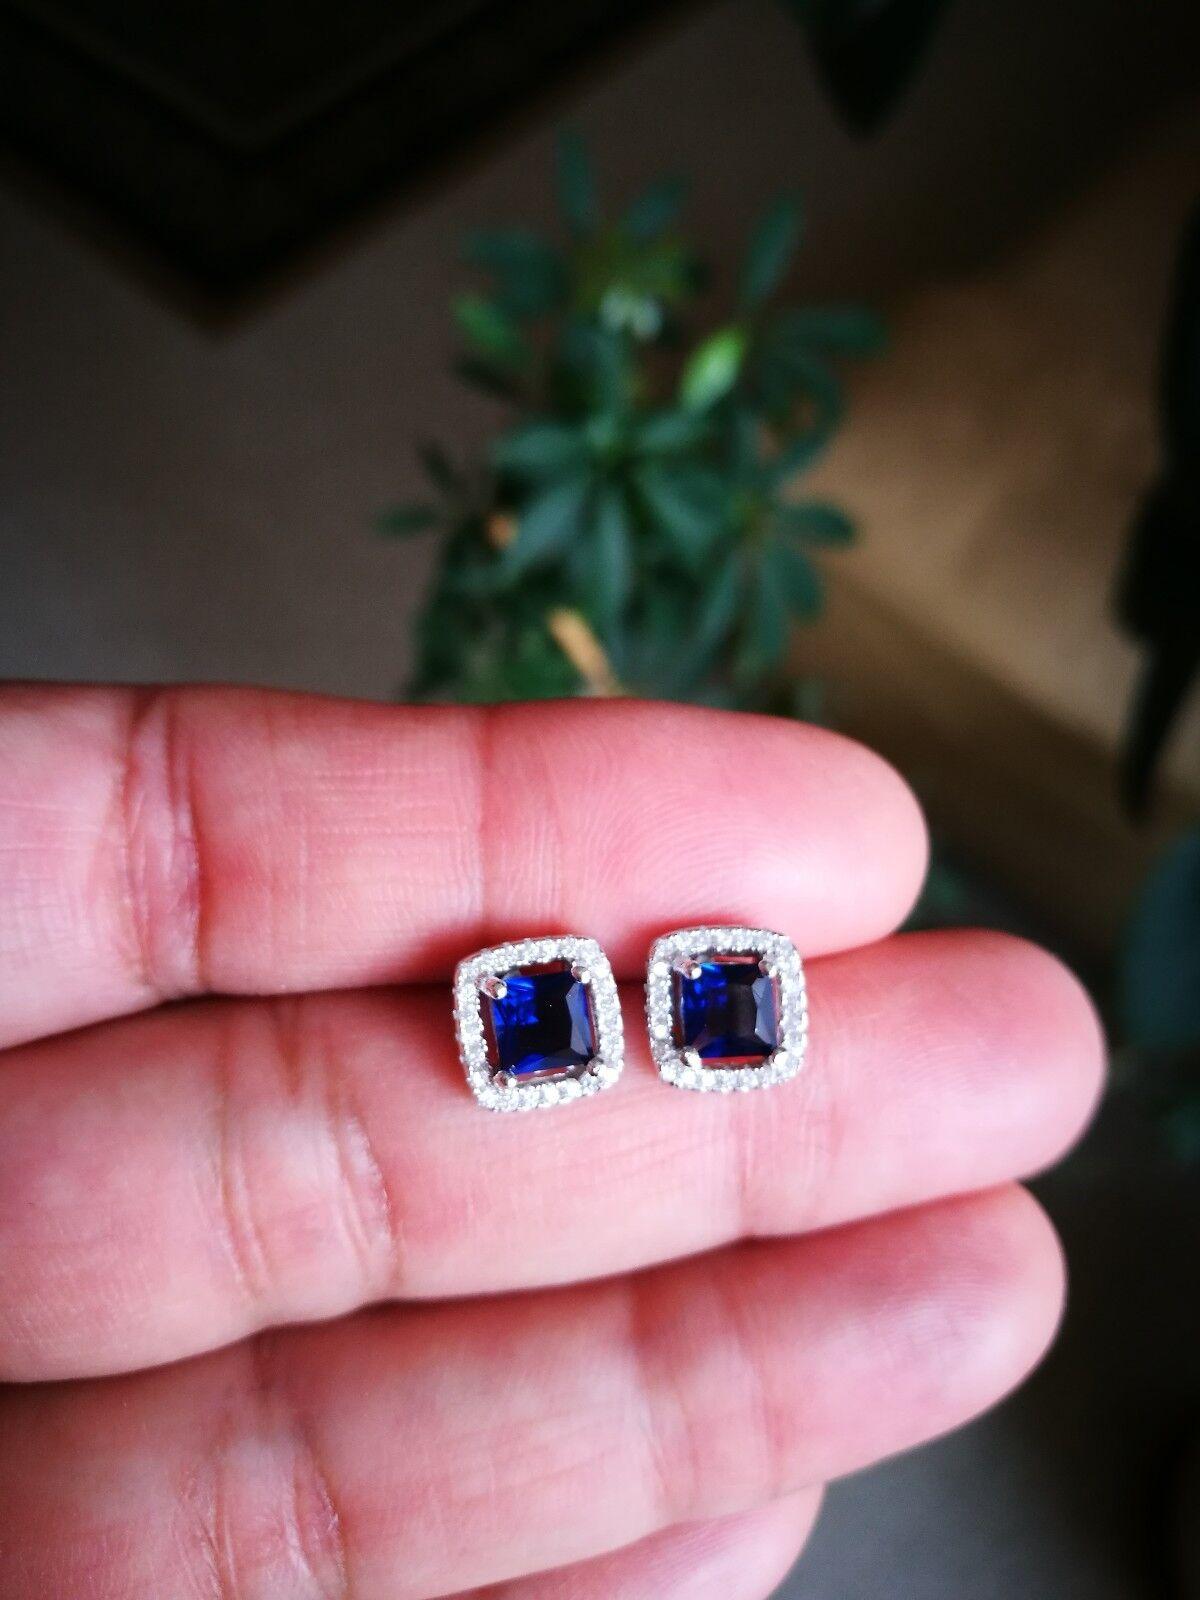 2 Ct Diamond Halo Stud Earrings with Blue Sapphire Women's Studs 14K White Gold 2